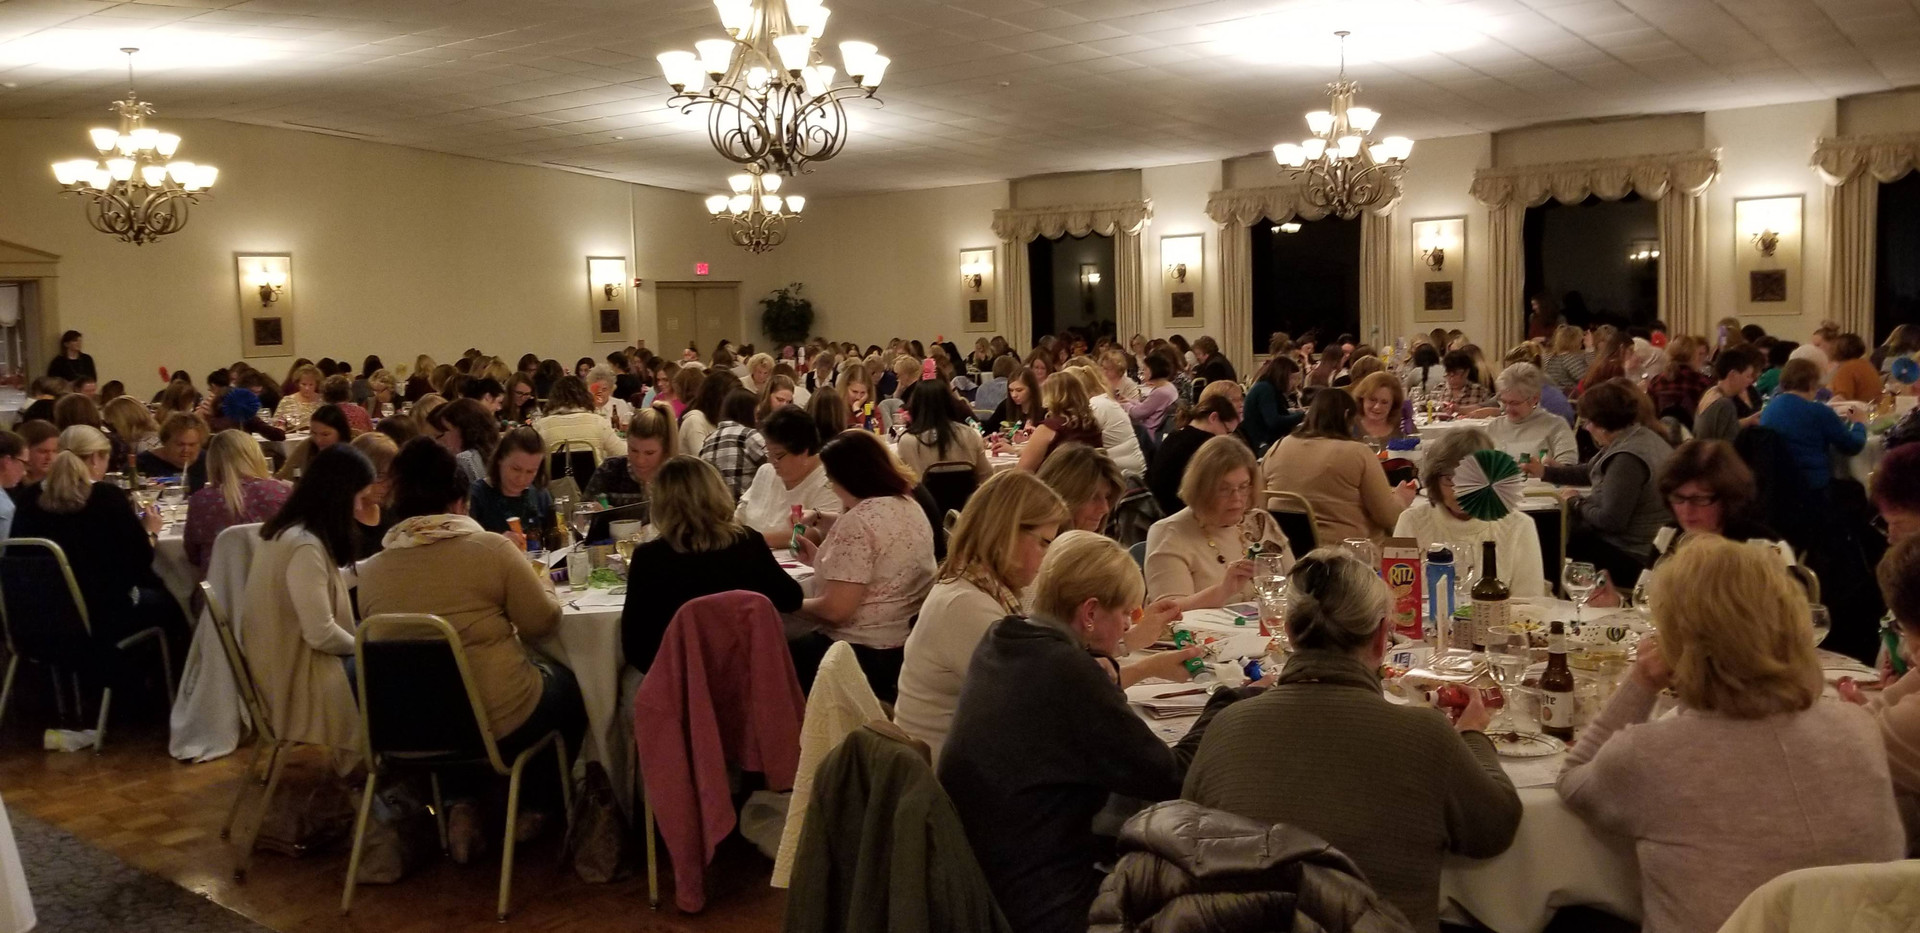 A full house for 2018 Pocketbook Bingo!